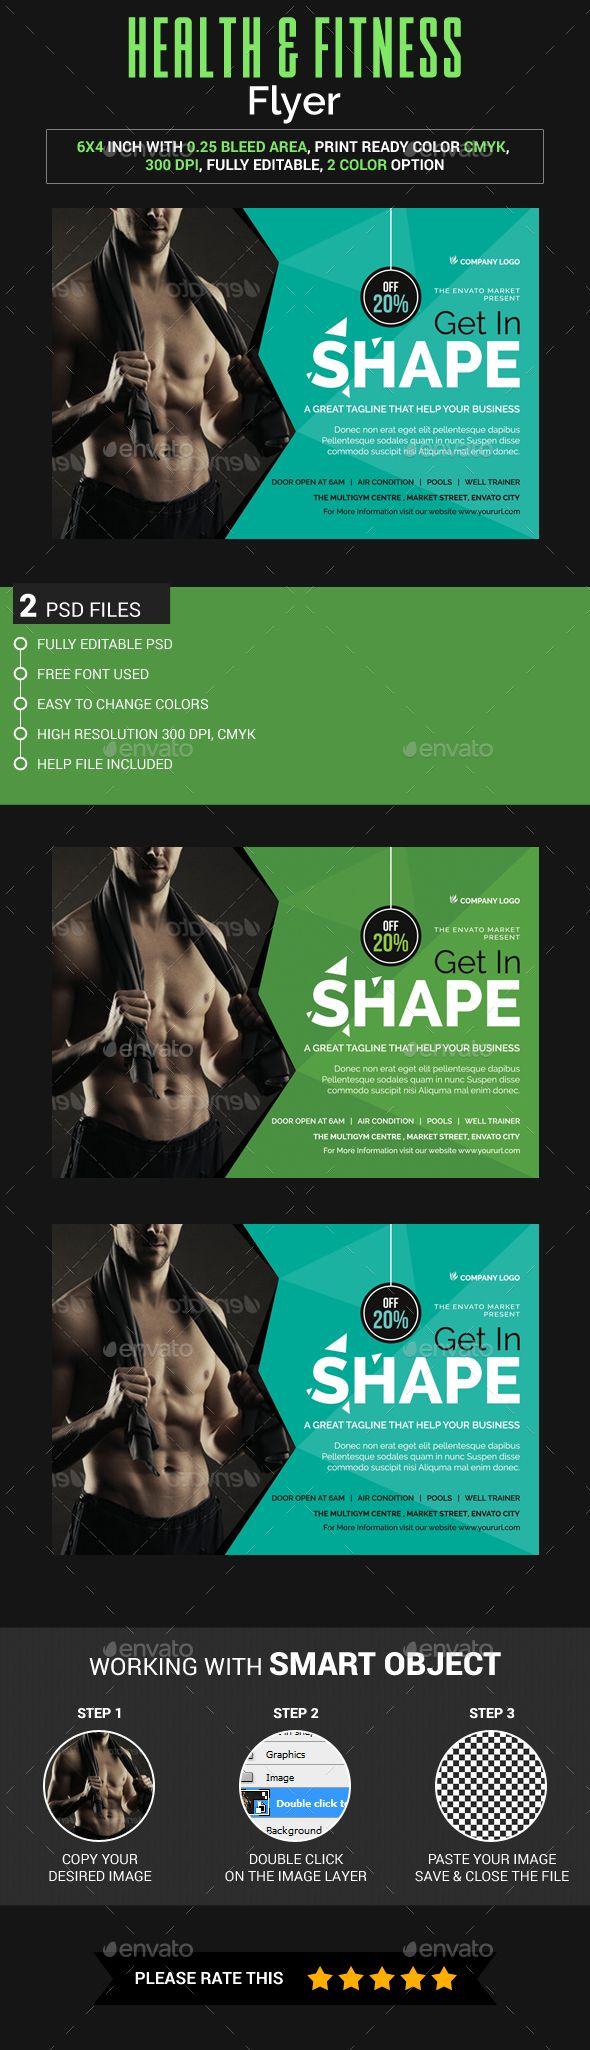 Health u0026 Fitness Flyer 681 best Fitness